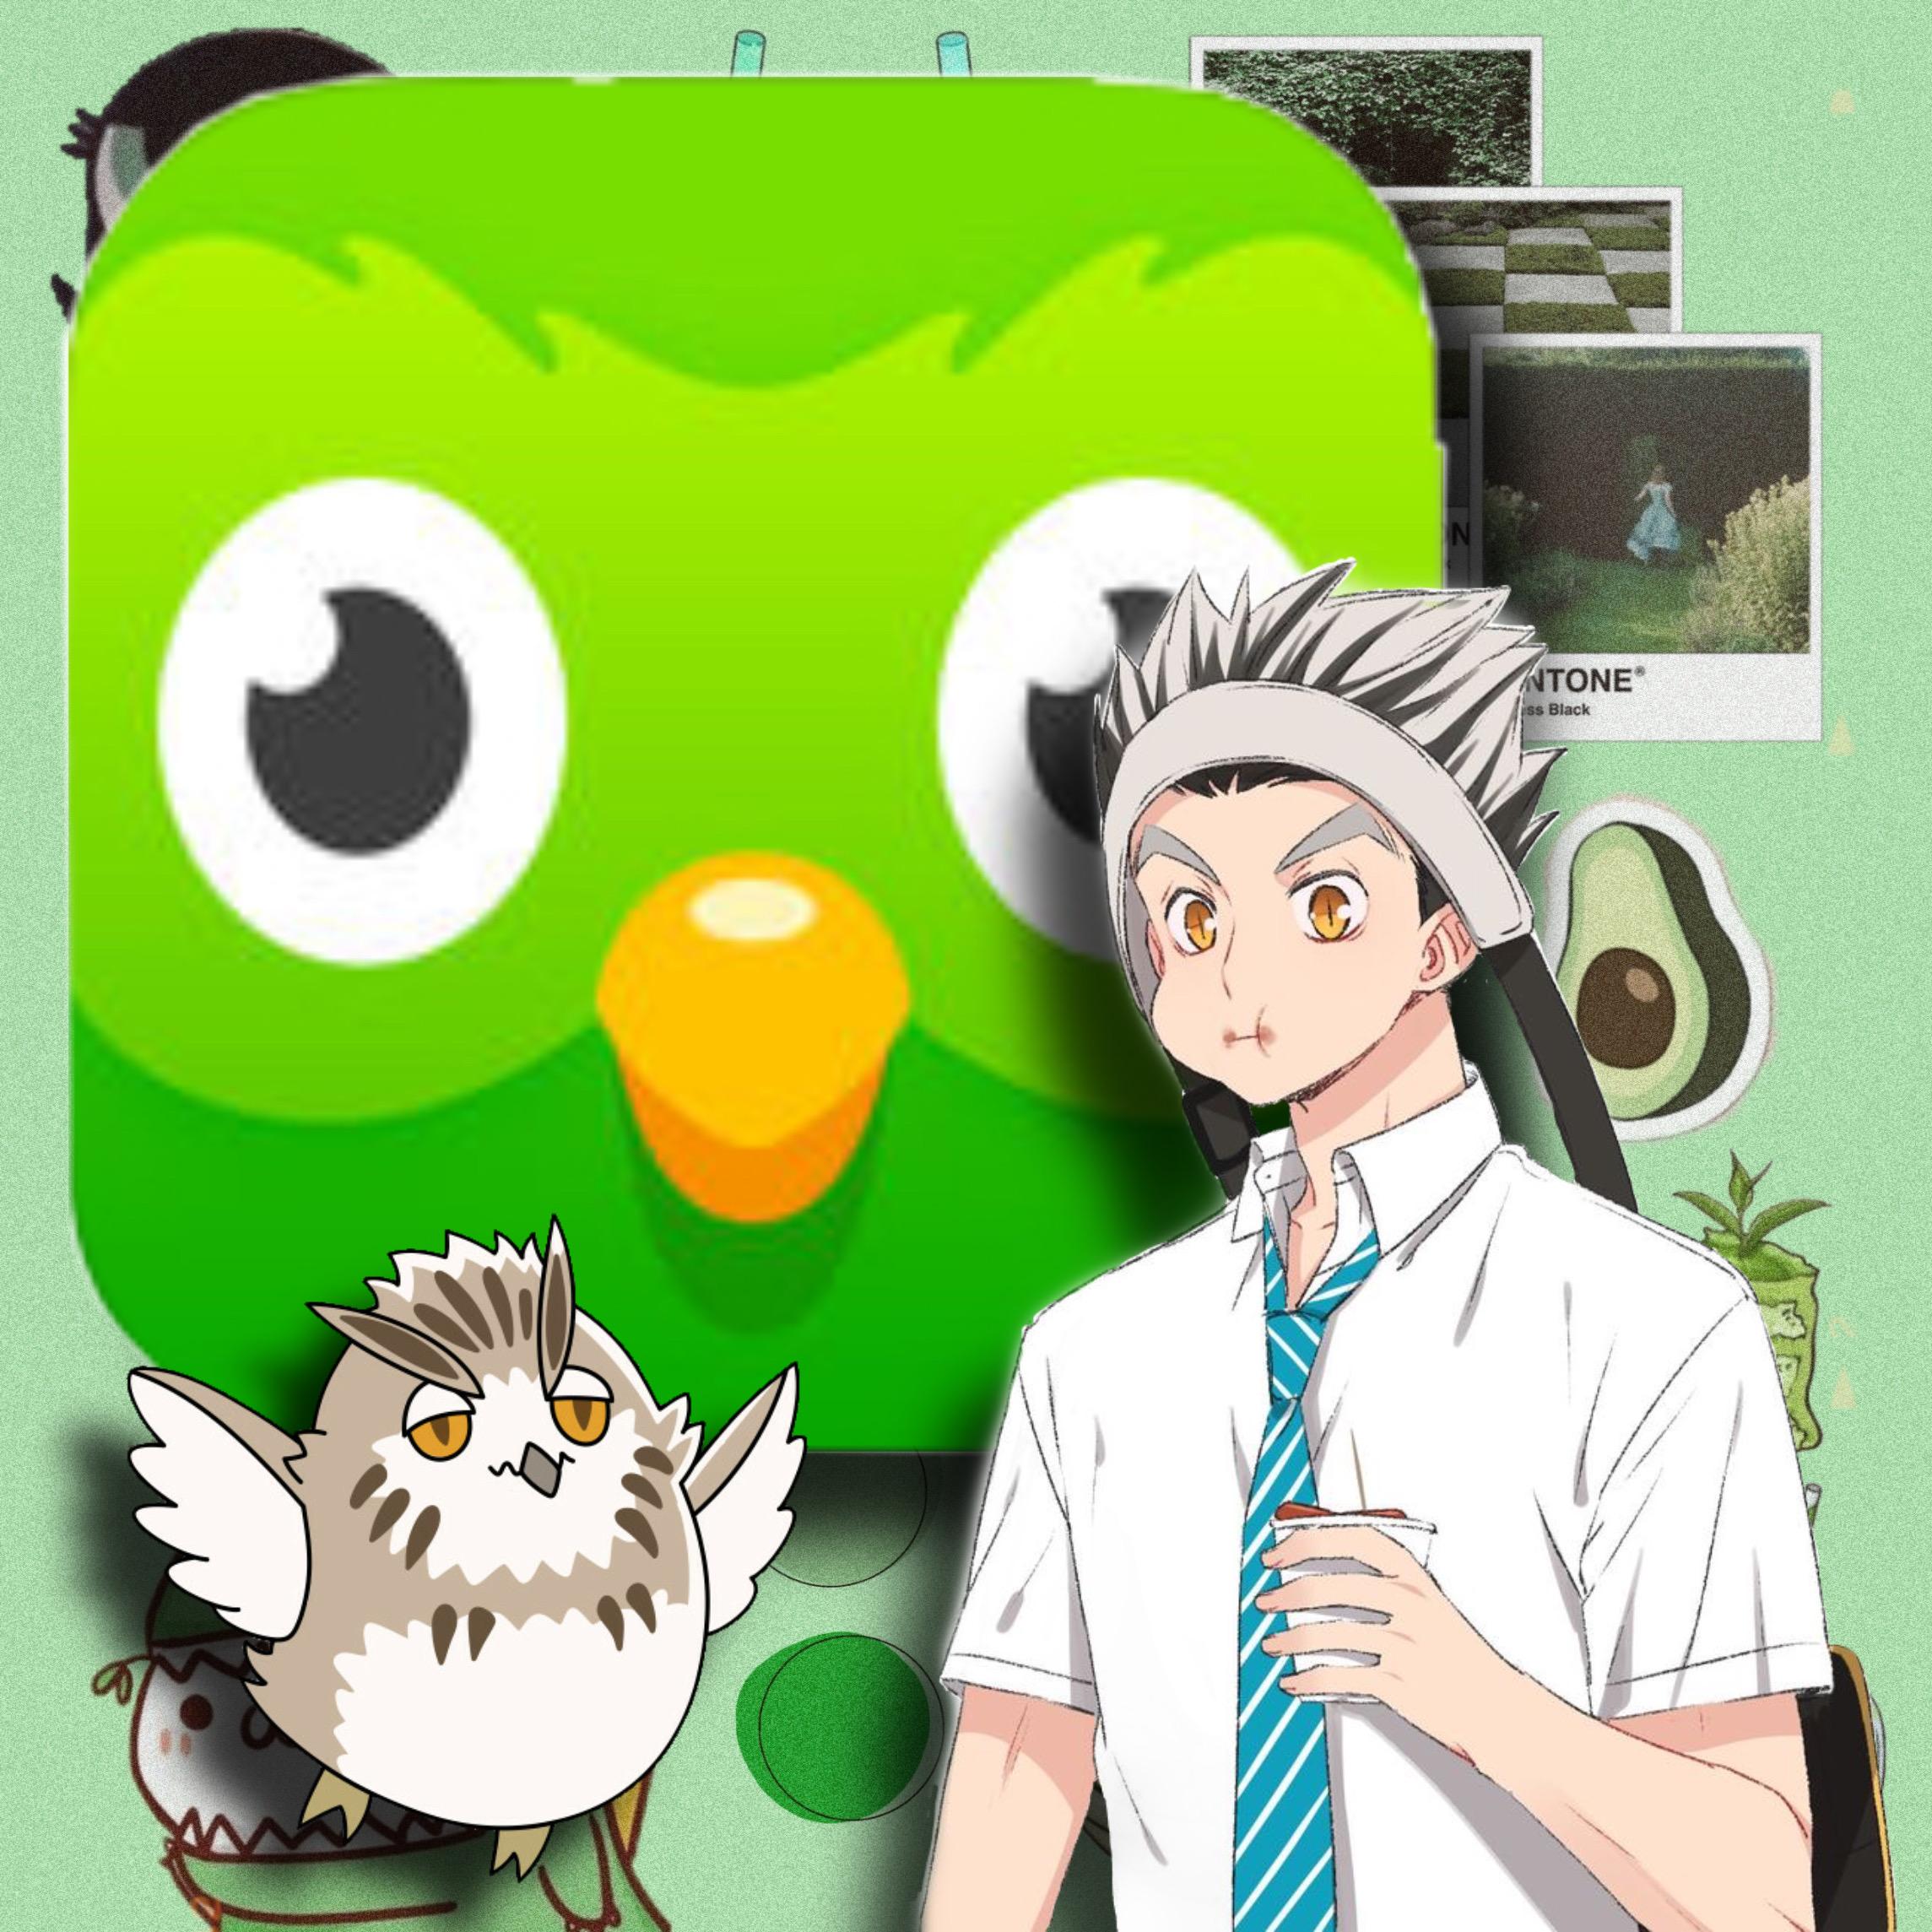 bokuto haikyuu green duolingo owl image